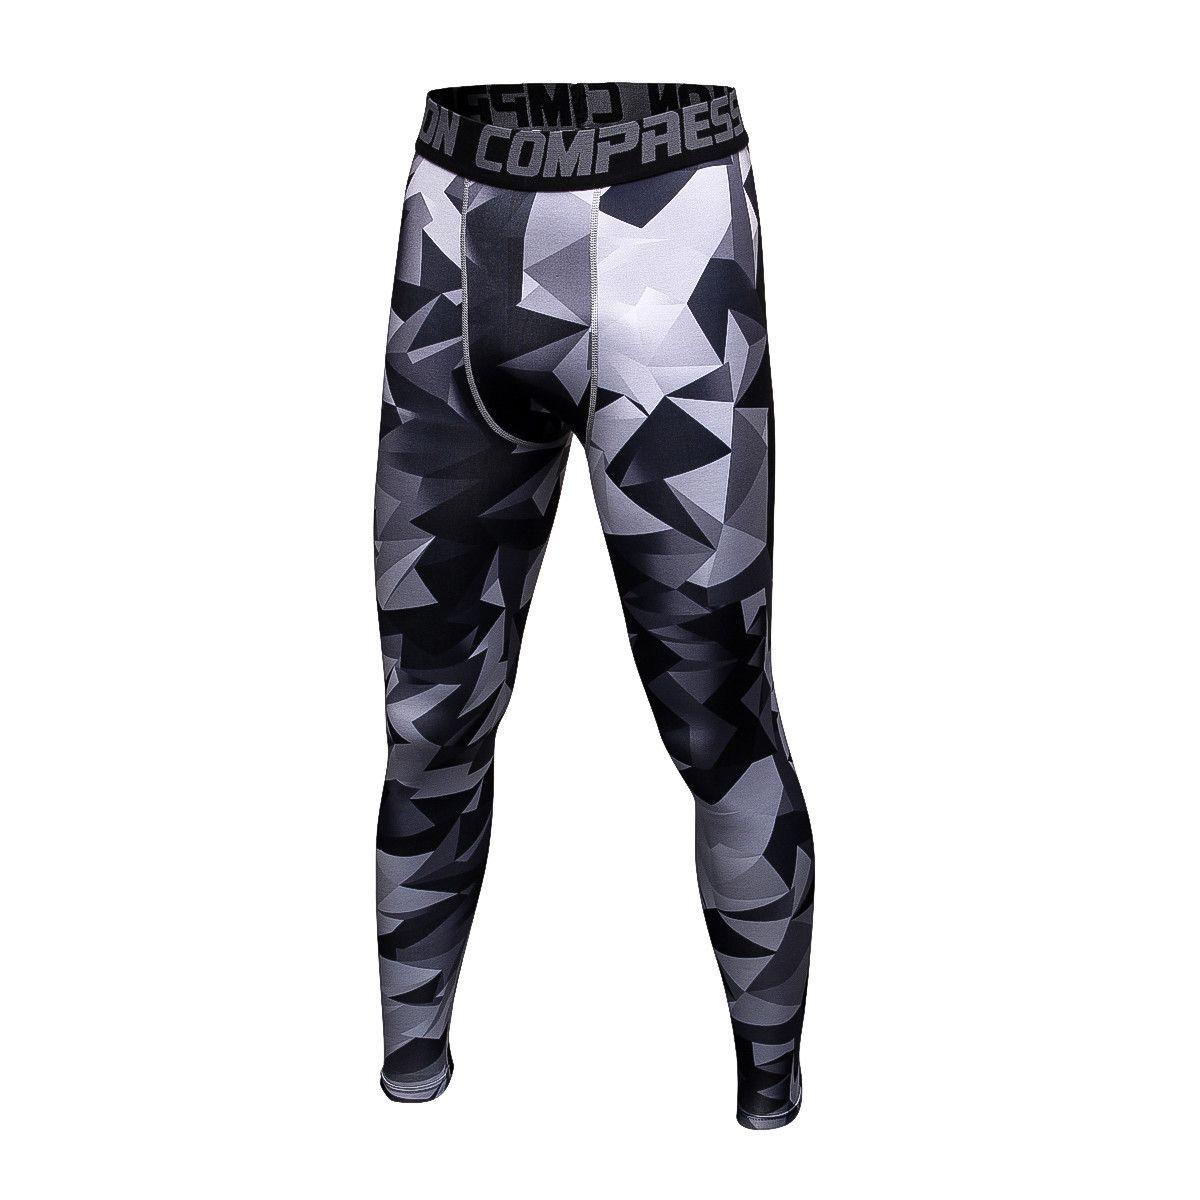 3d75308c0a3 Mens Compression Pants Bodybuilding Jogger Fitness Exercise Skinny ...